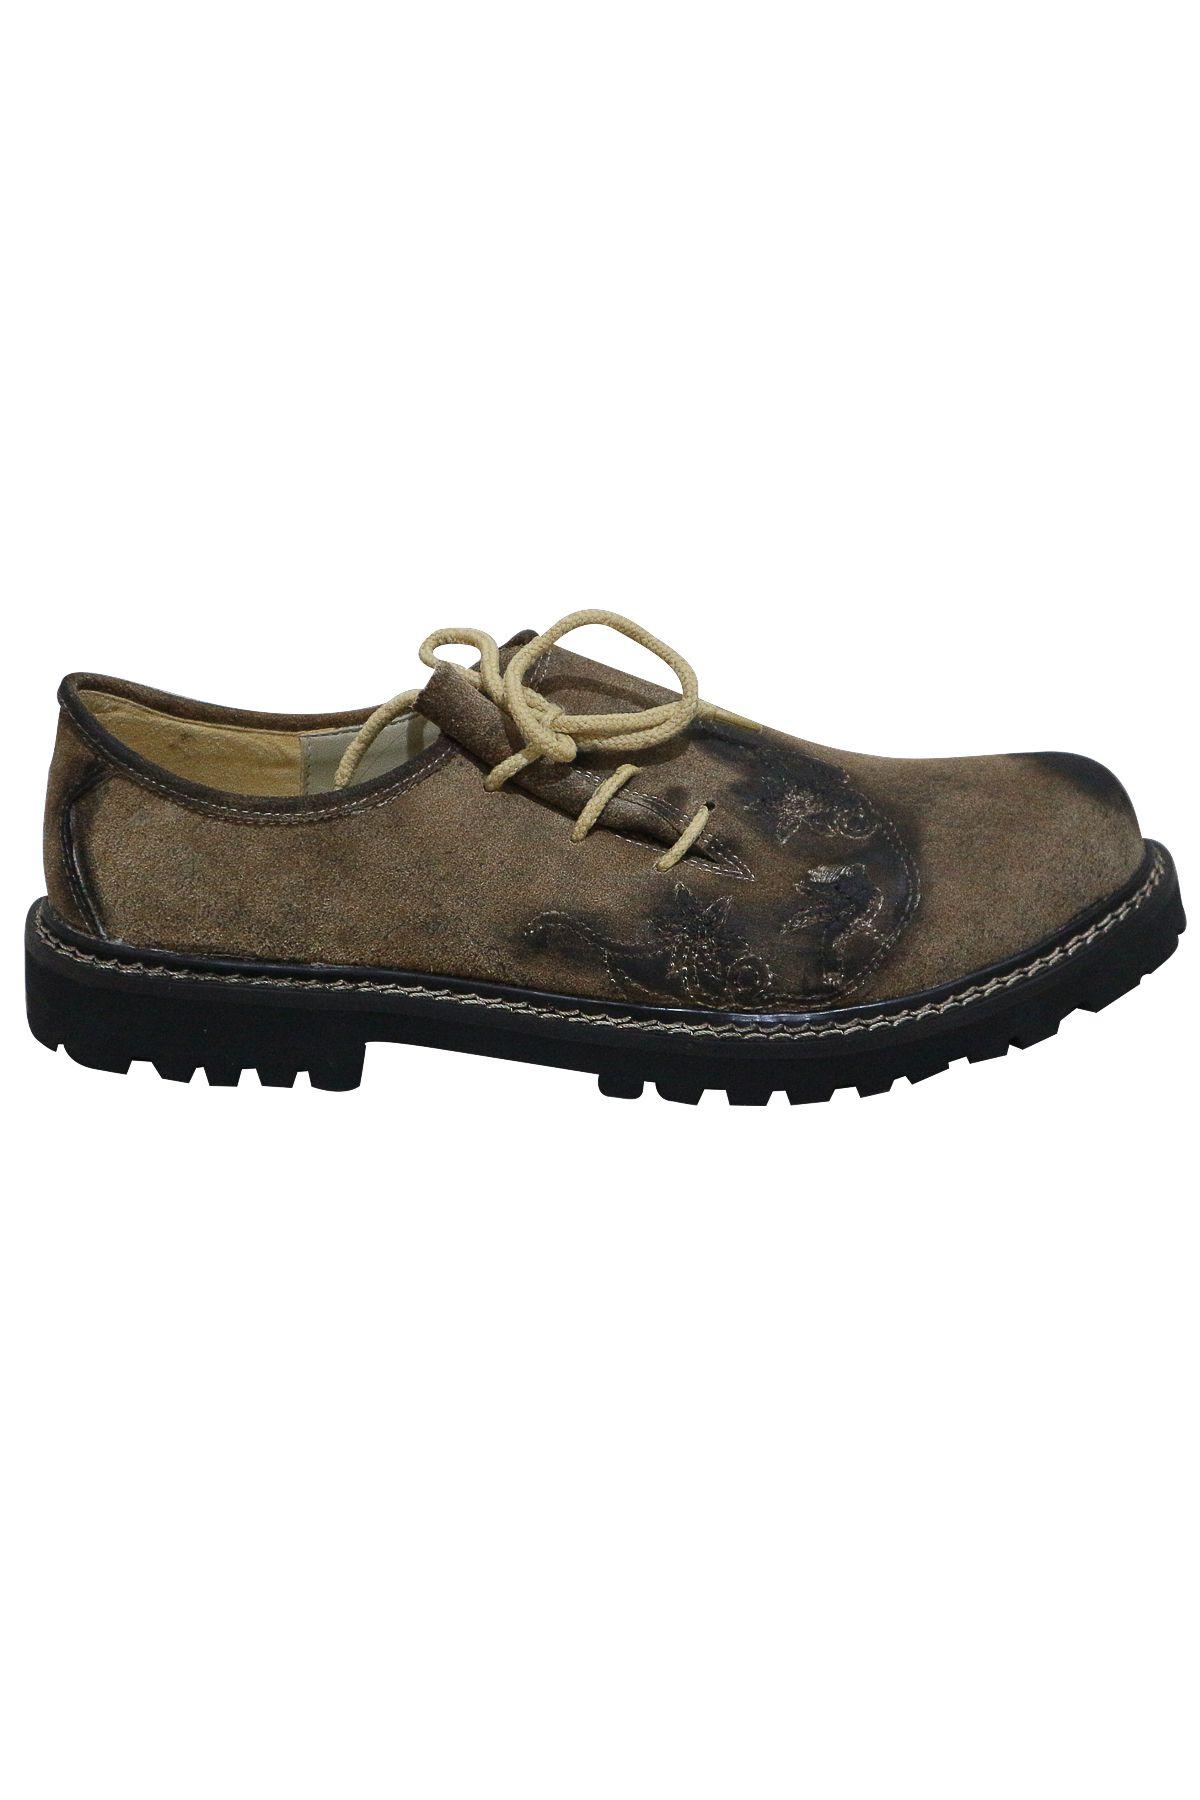 1bd2c851aae0 Trachten Lederhosen Shoes Light Brown Original Leather - Lederhosen ...